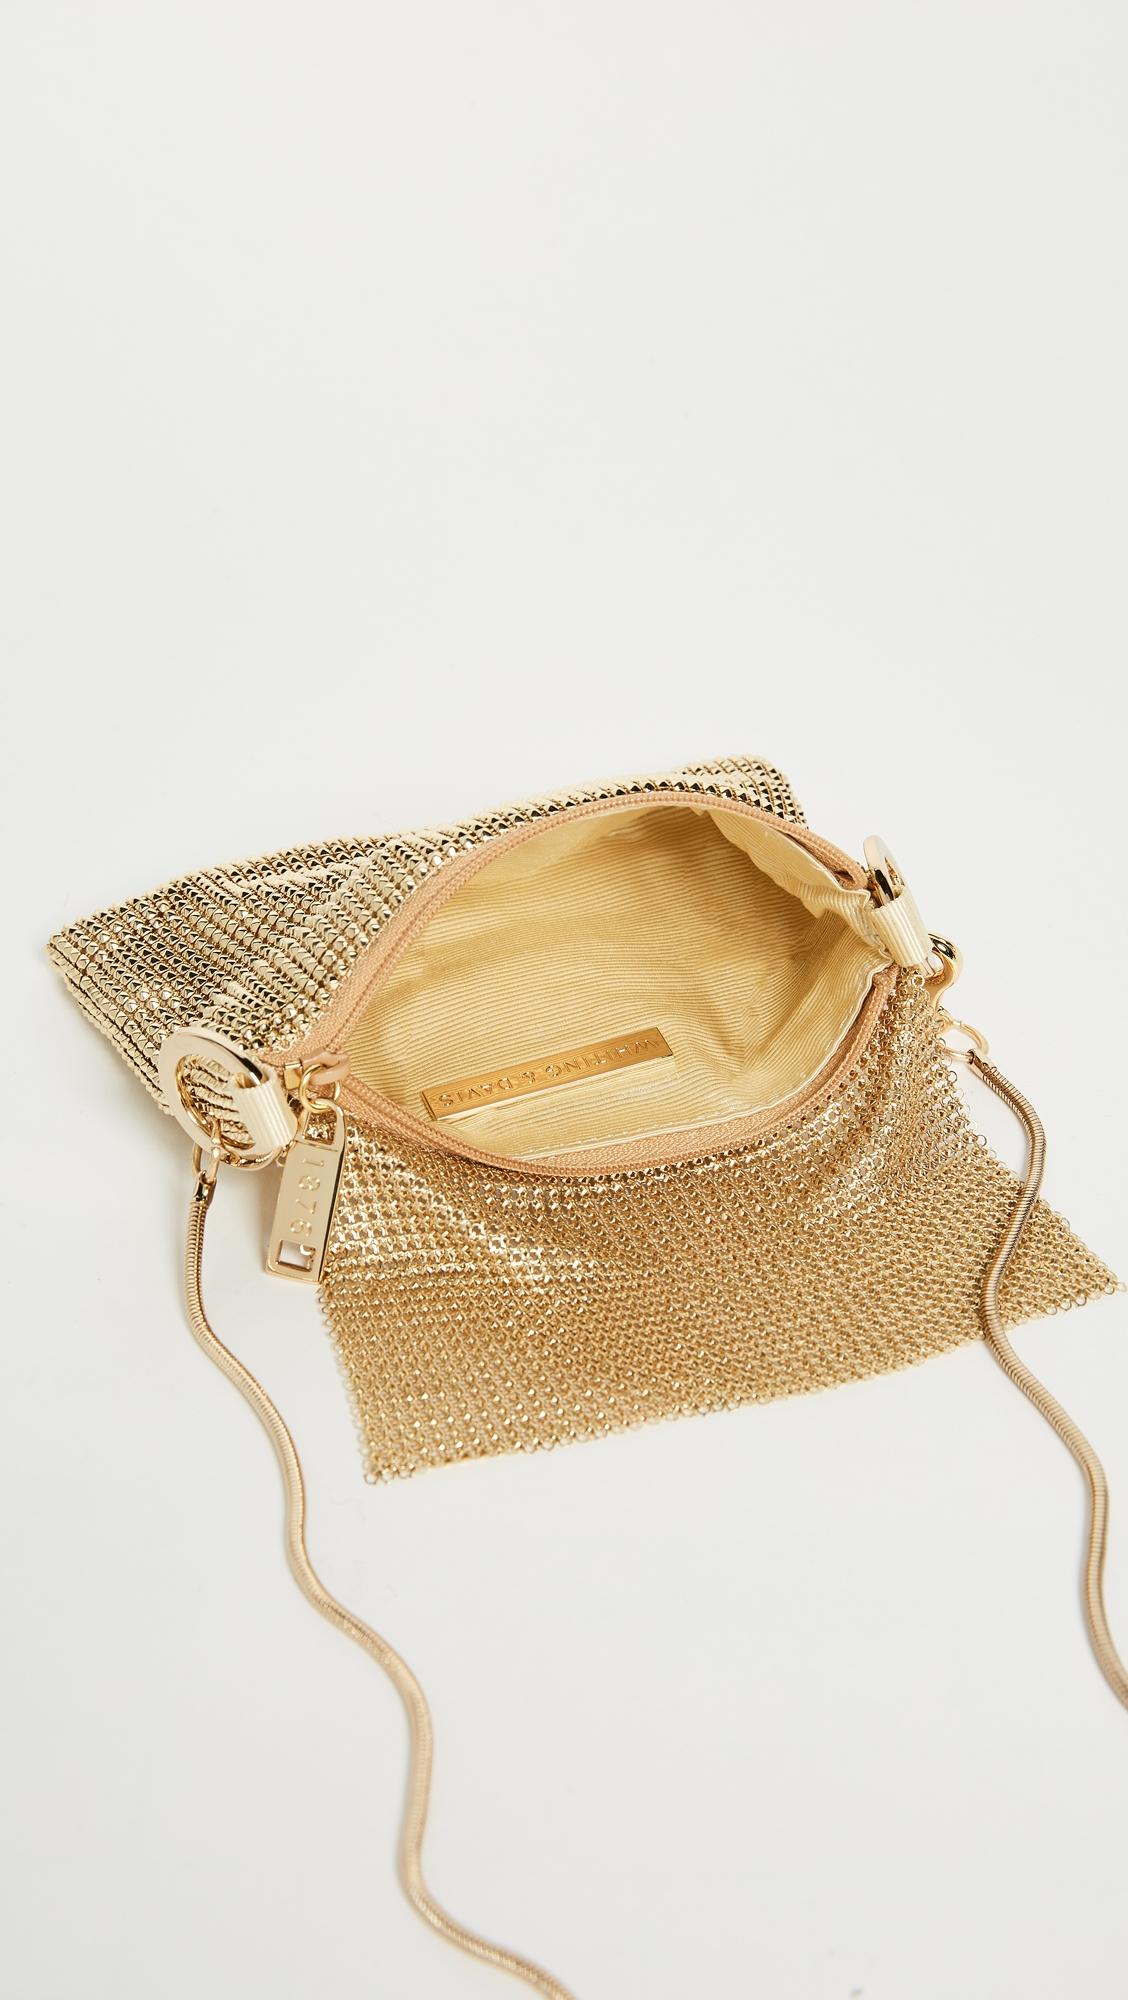 Сетчатая сумка через плечо Pyramid Whiting & Davis  (WDAVS2013211739314)